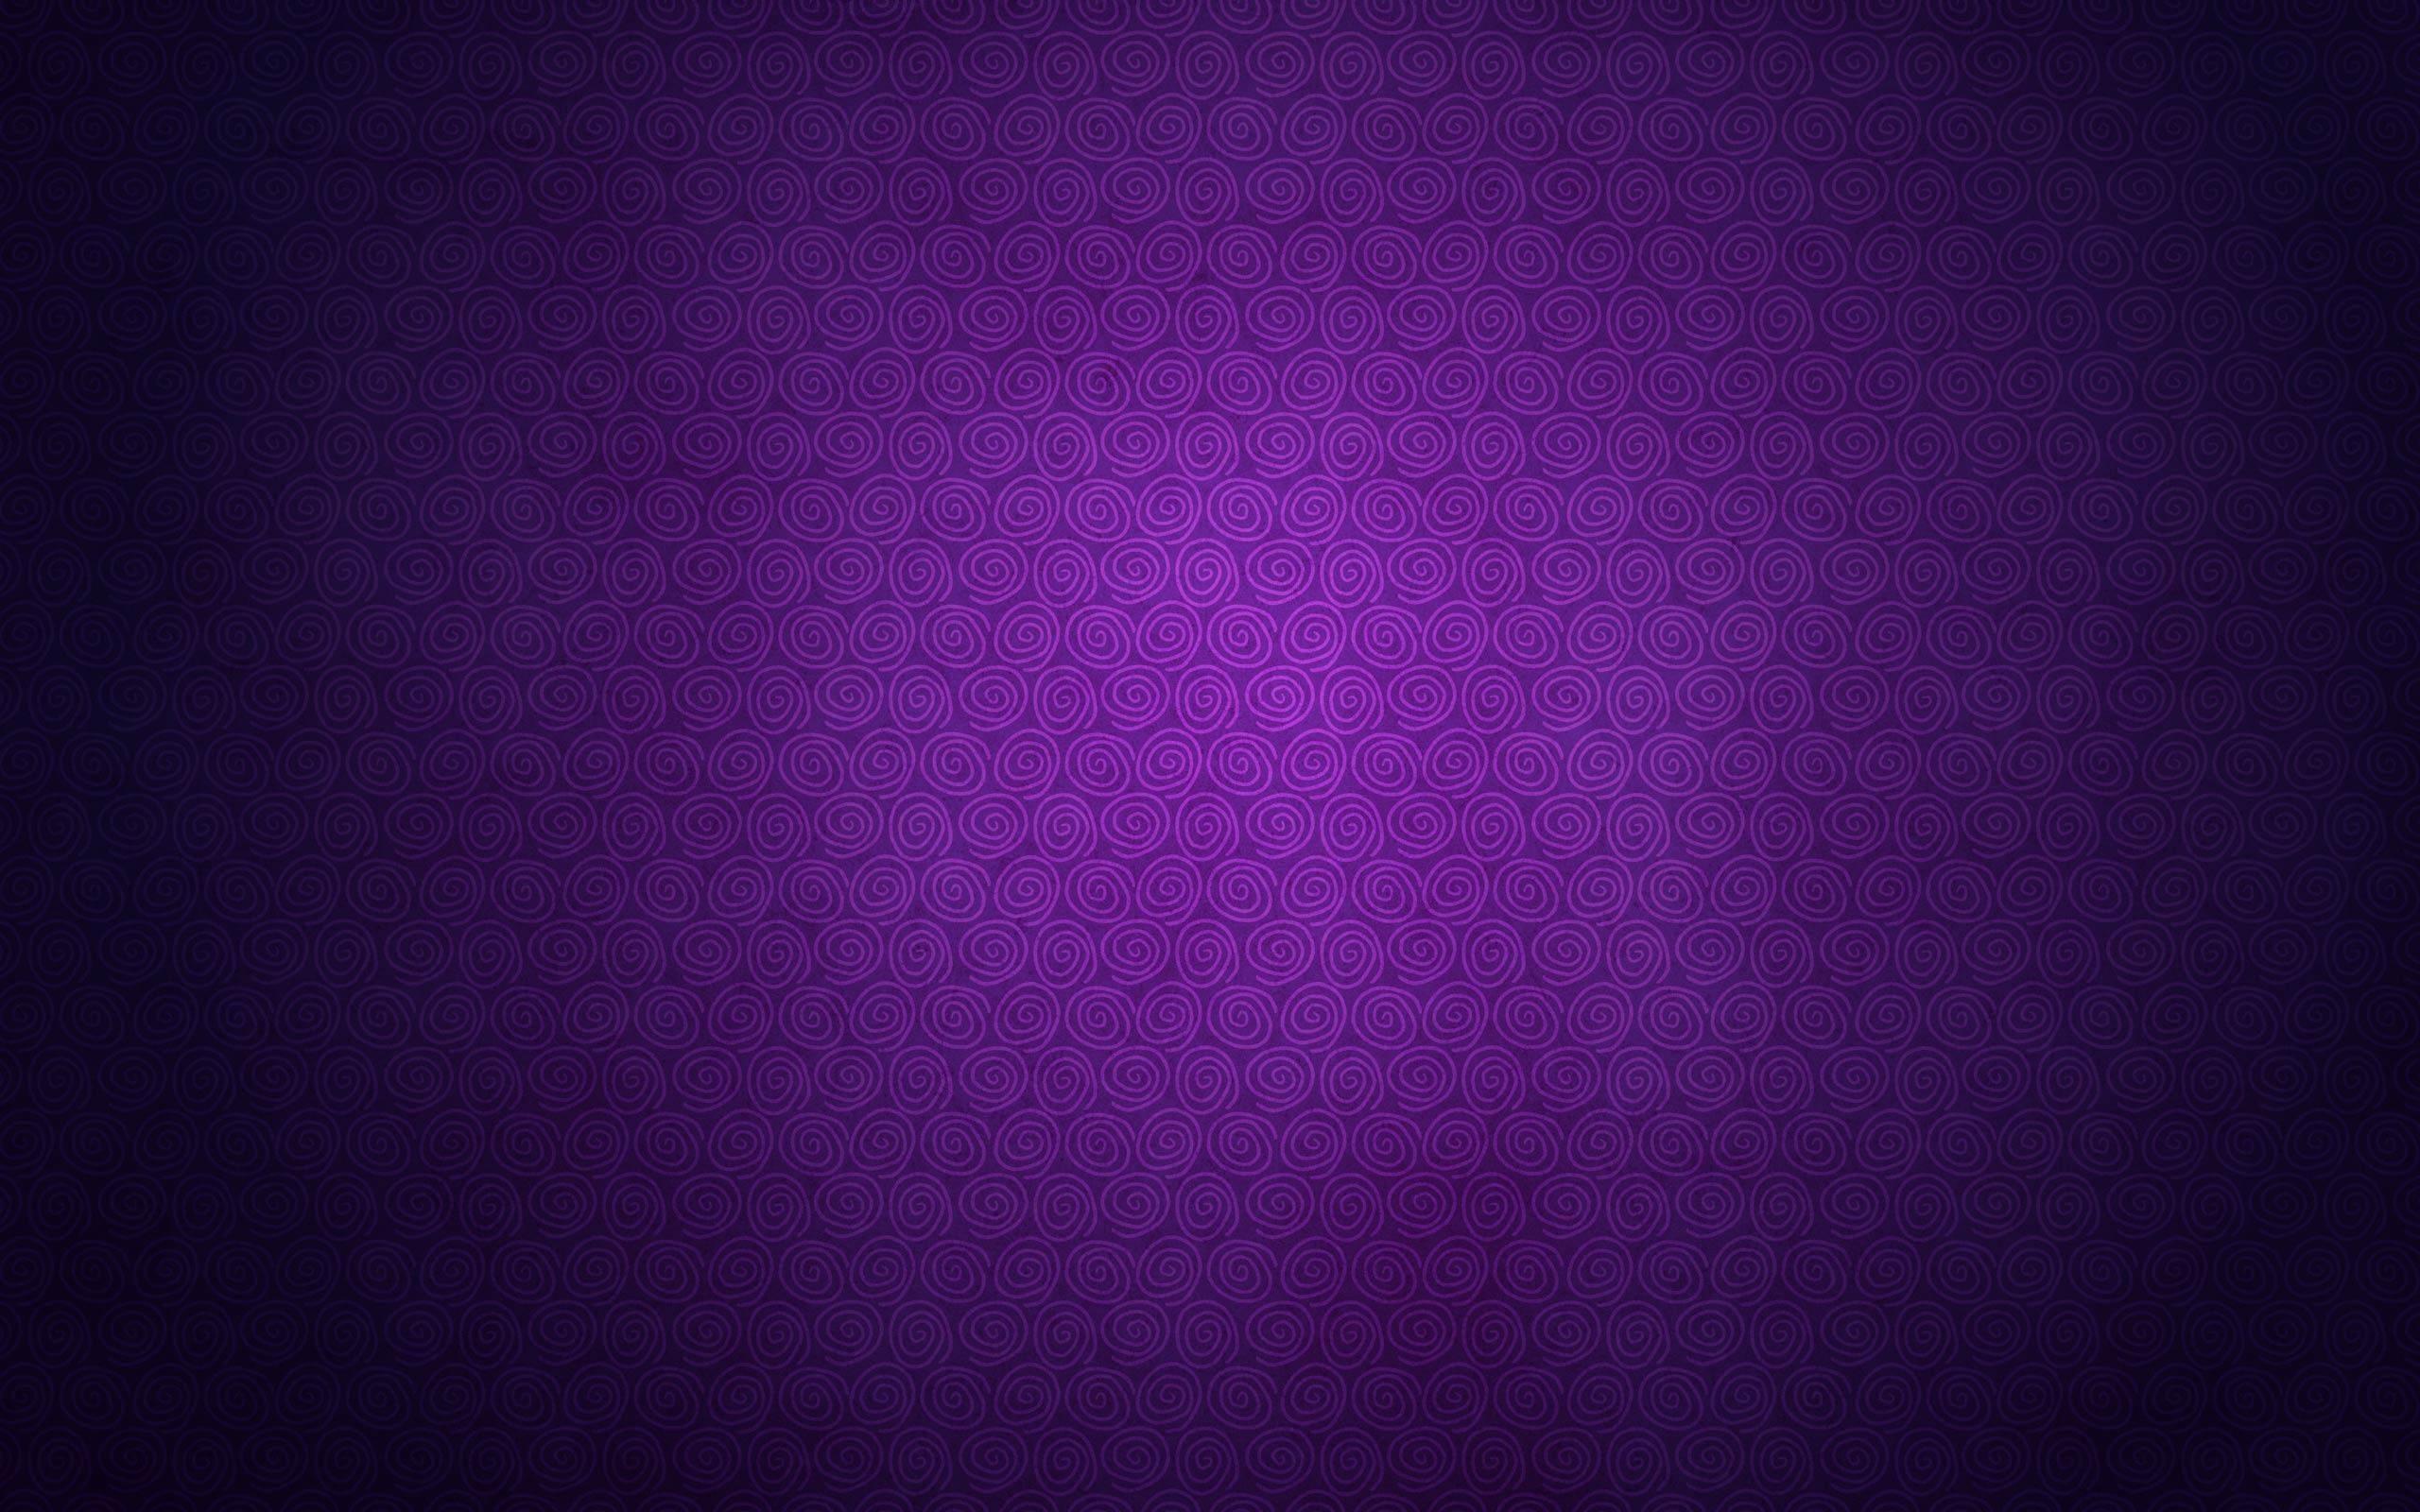 Purple Wallpapers 12 Best Wallpapers Collection Desktop: Purple Wallpaper For Computer (60+ Images